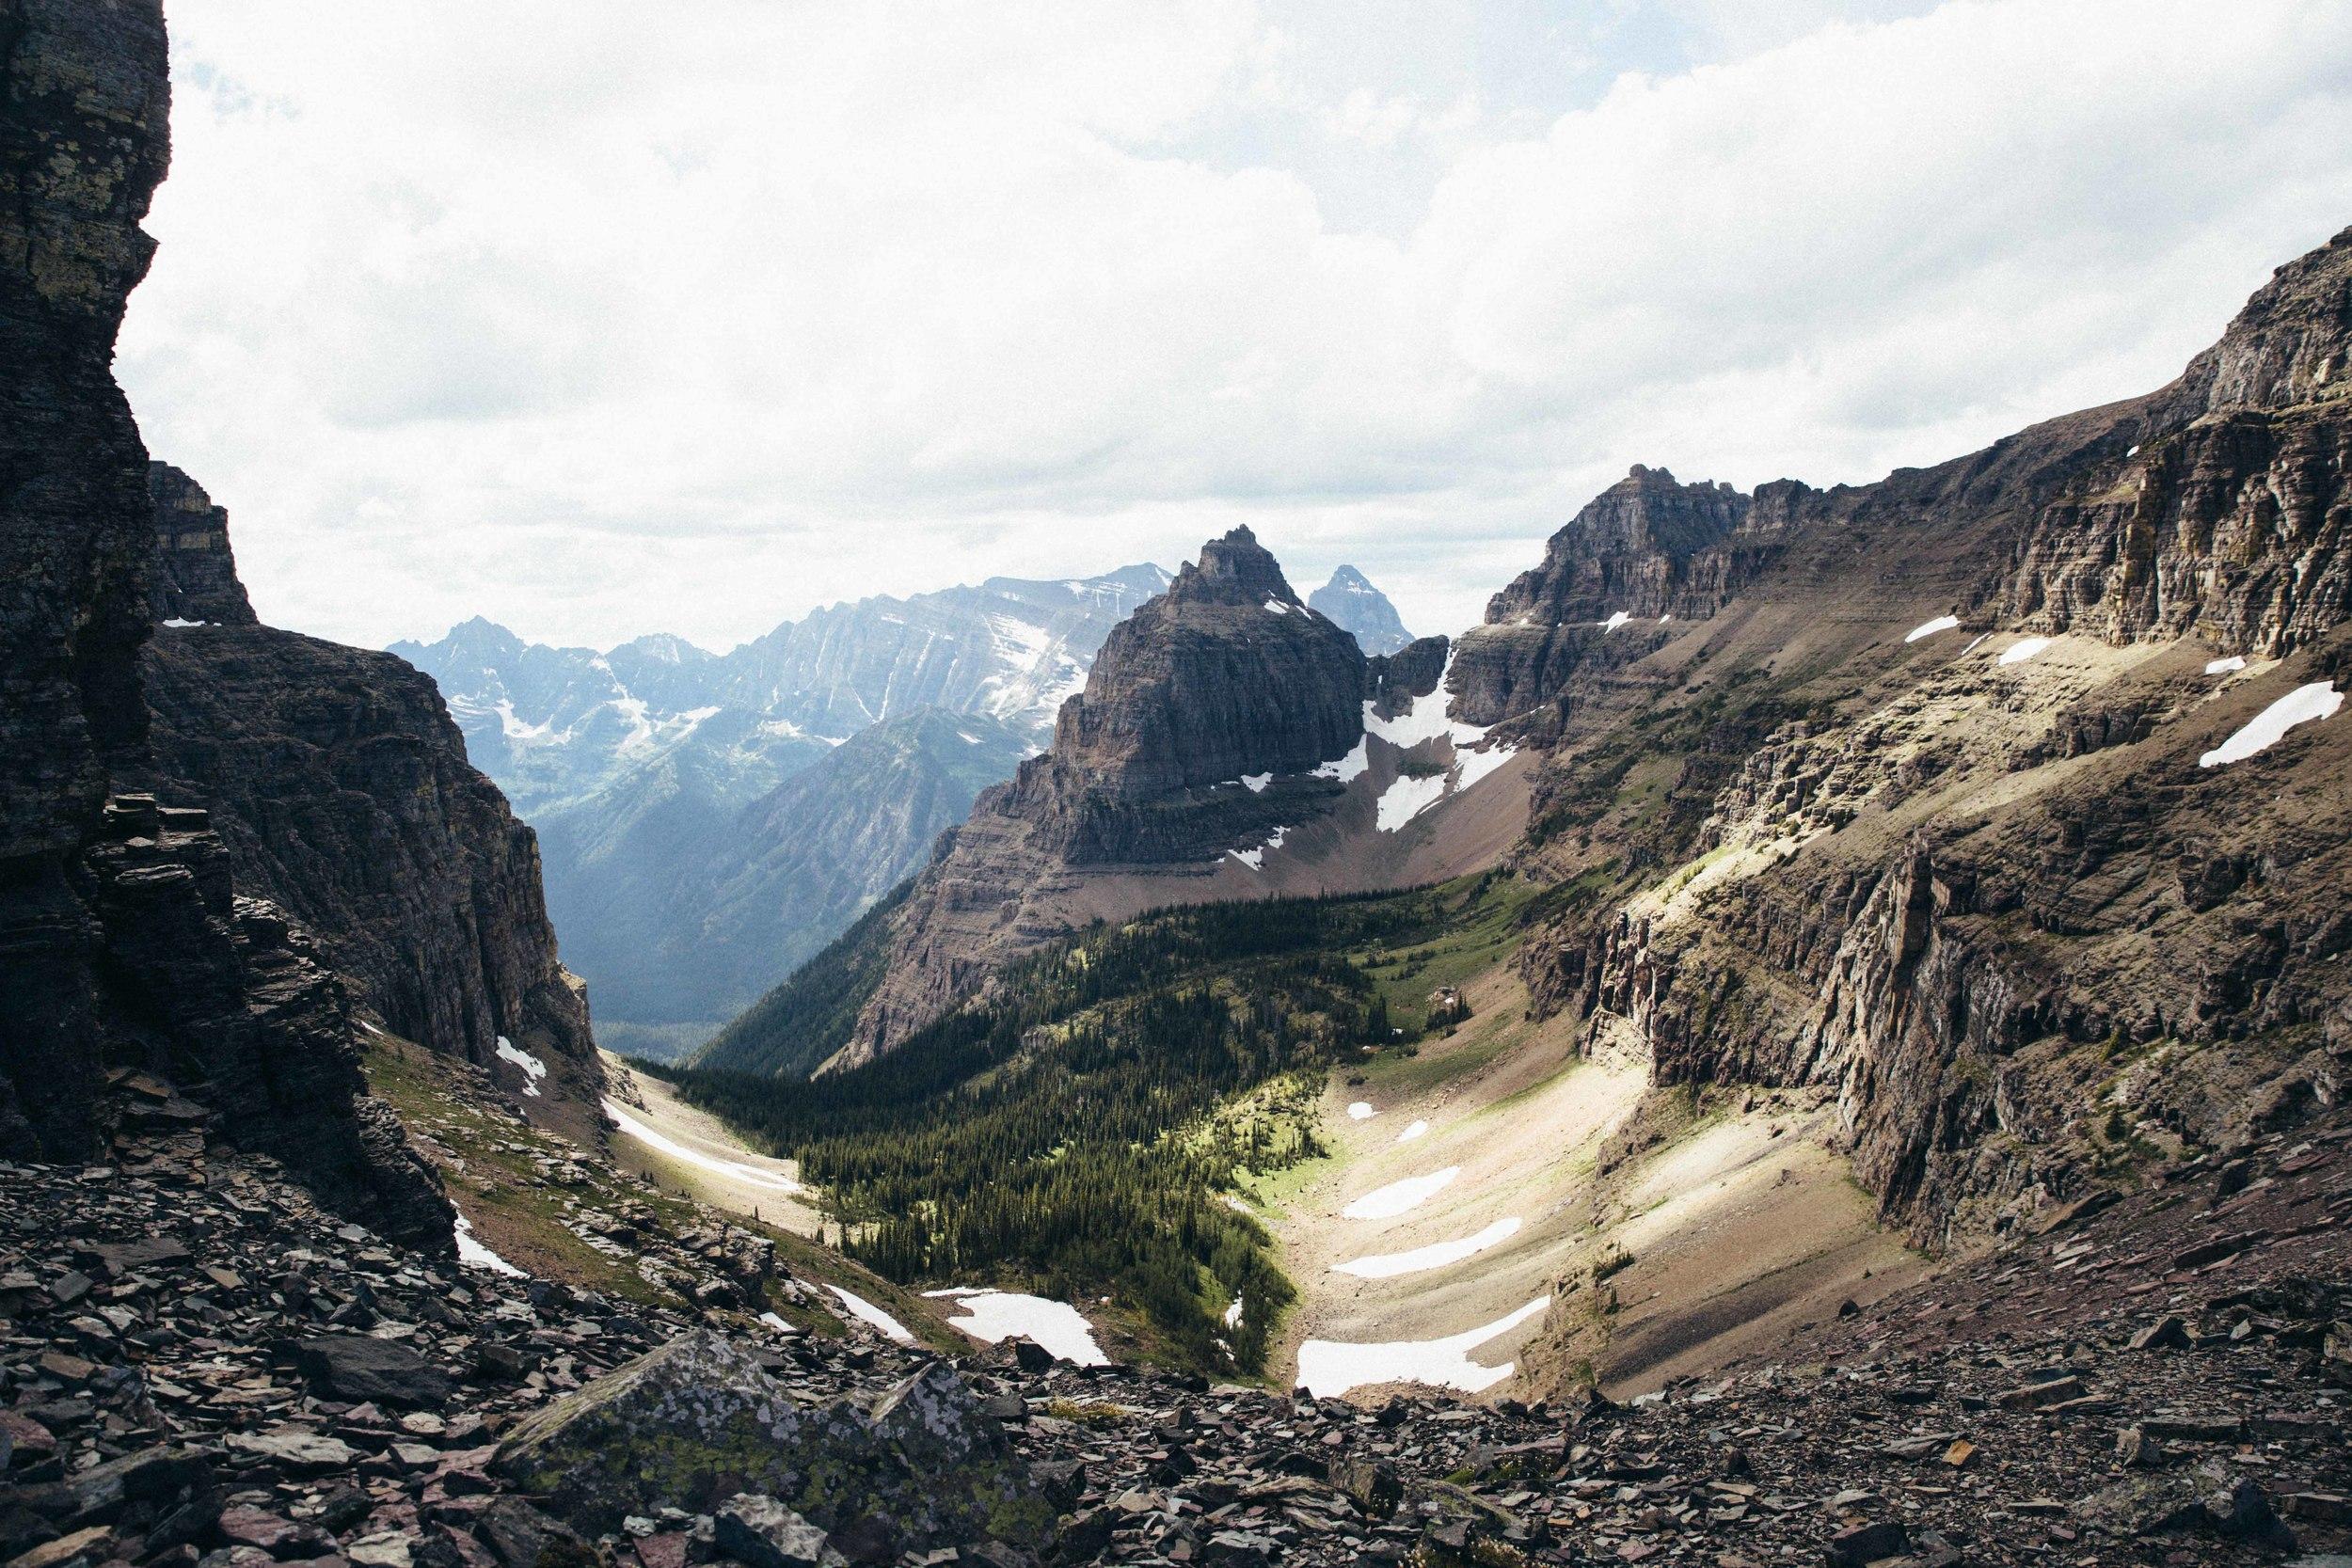 ajwells_glacier_web_71.jpg